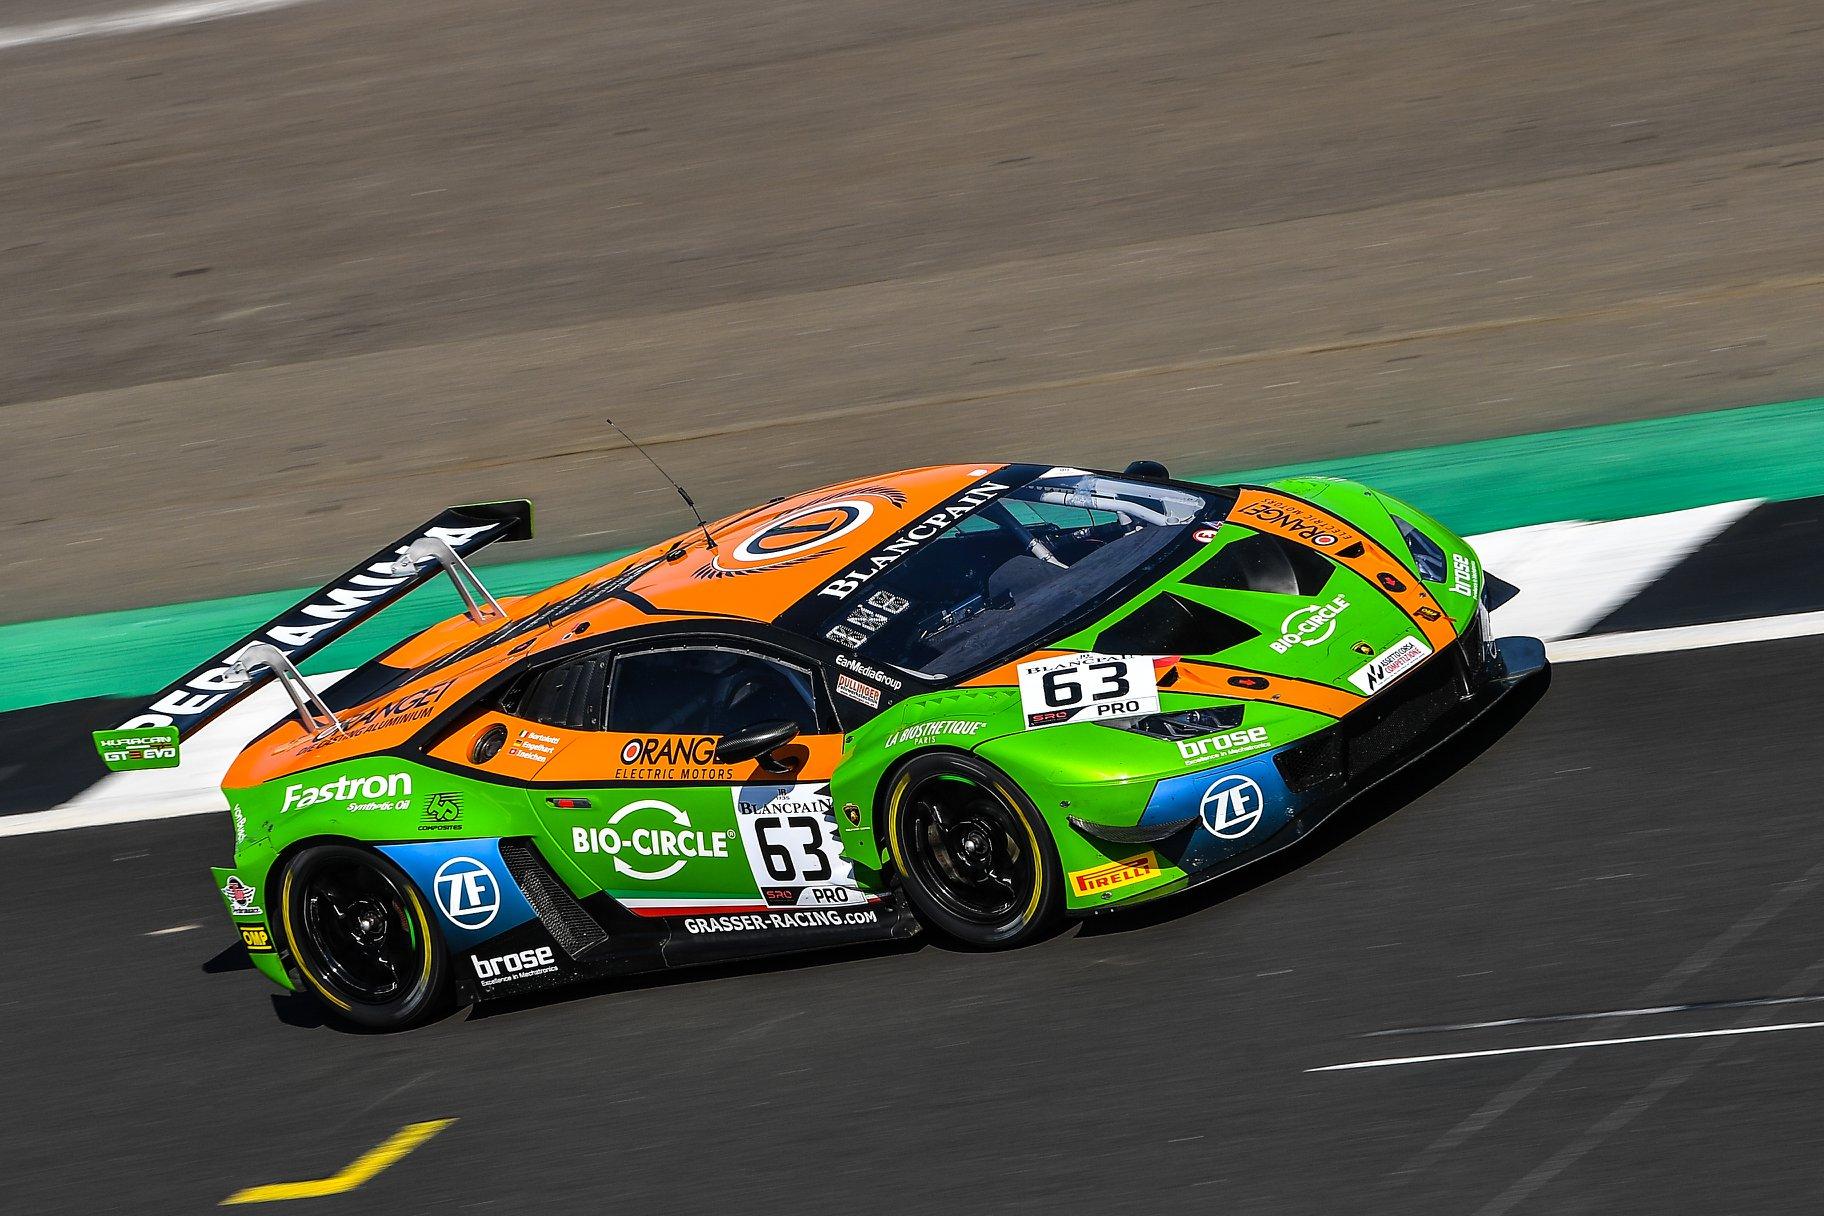 Orange1 Team GRT lives through bitter-sweet déjà-vu at the Blancpain GT Series Endurance Cup in Silverstone